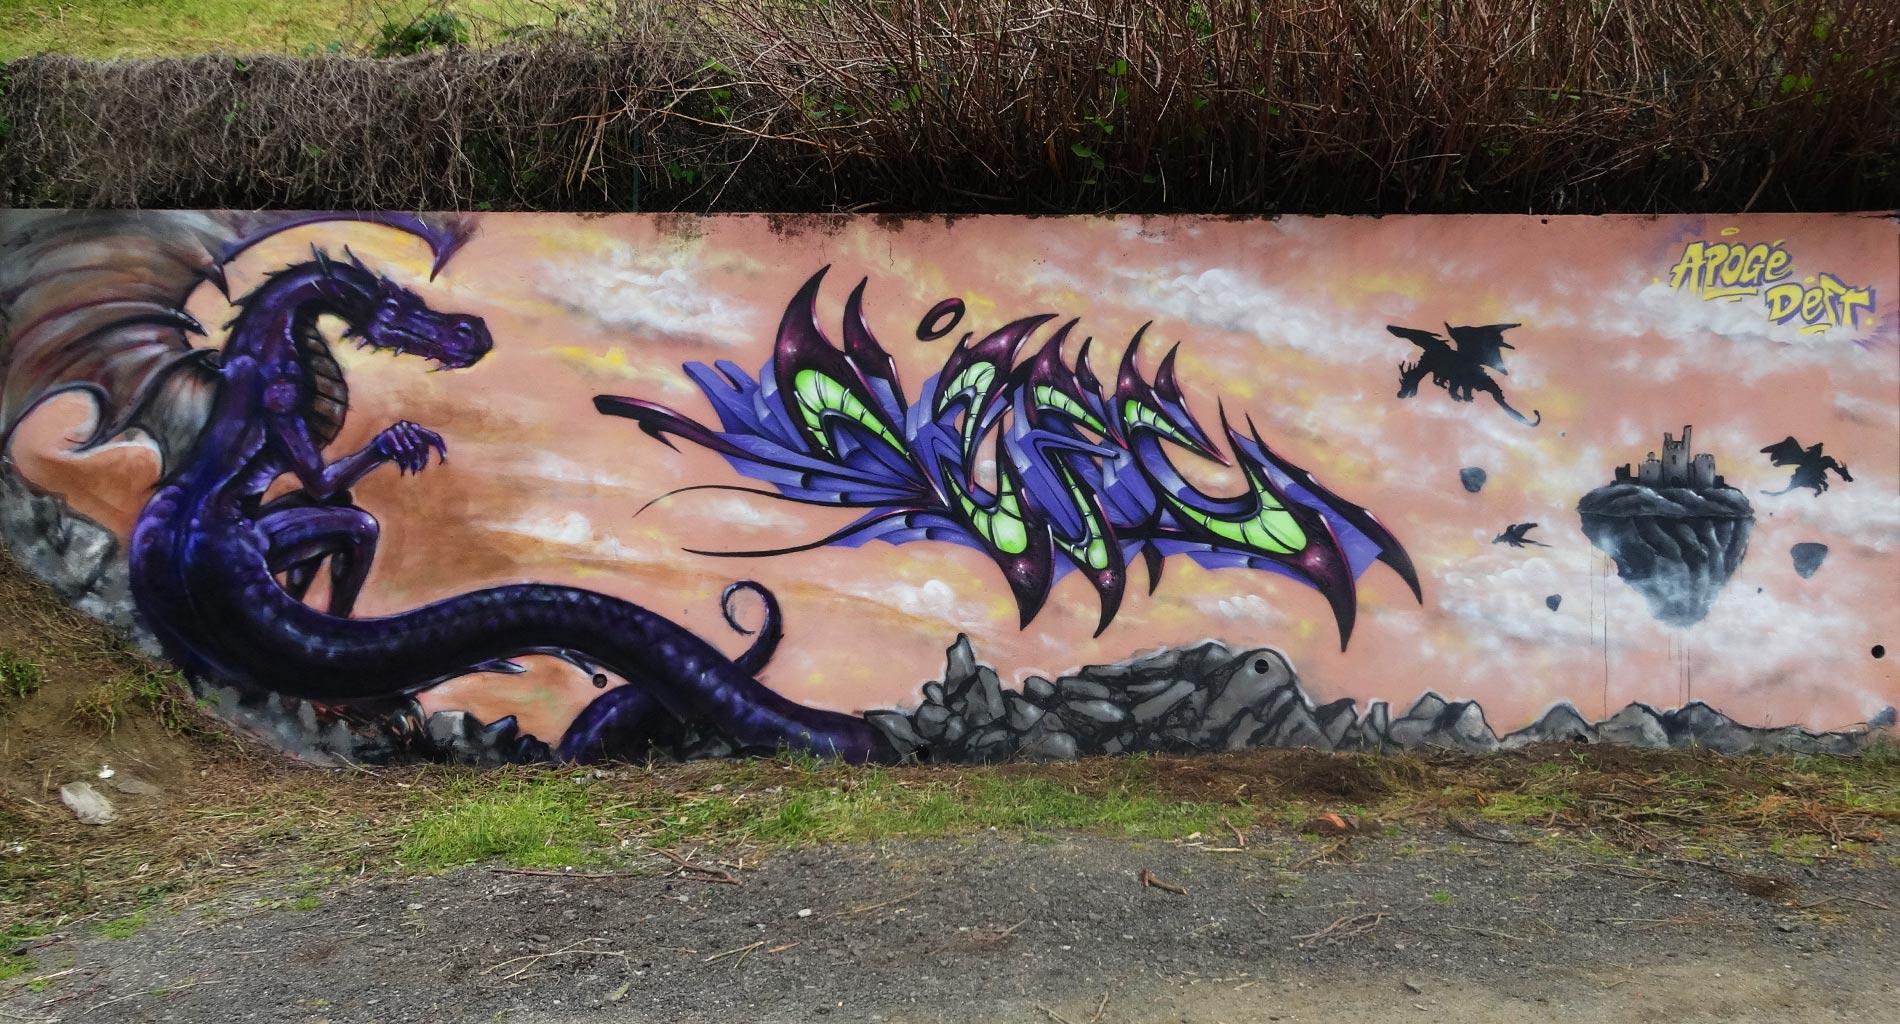 Graffiti Clermont-Ferrand Street art